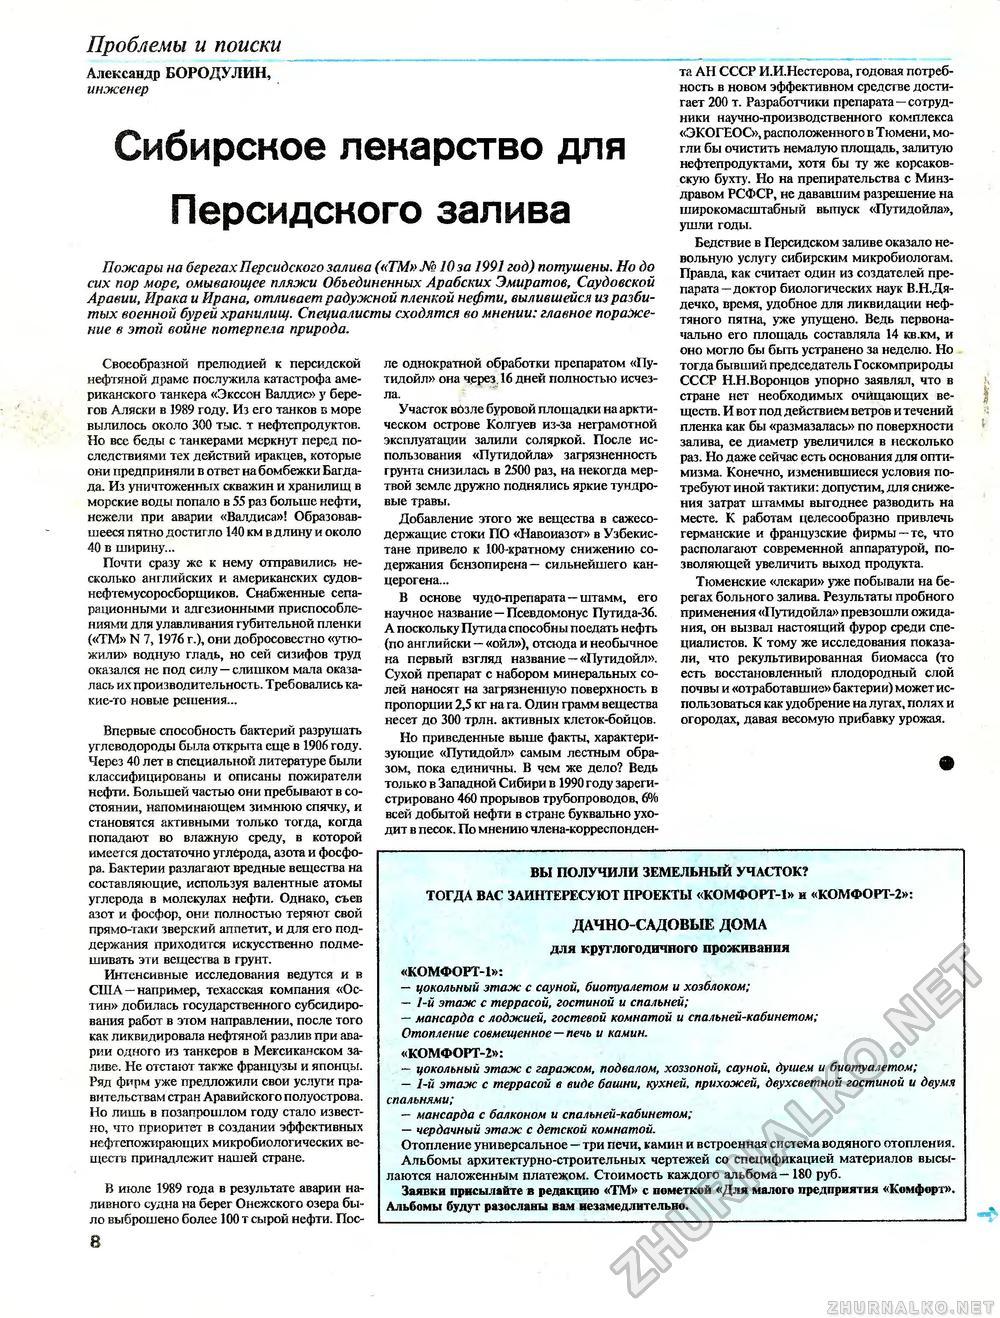 ДУЗОФАРМ таблетки - инструкция по